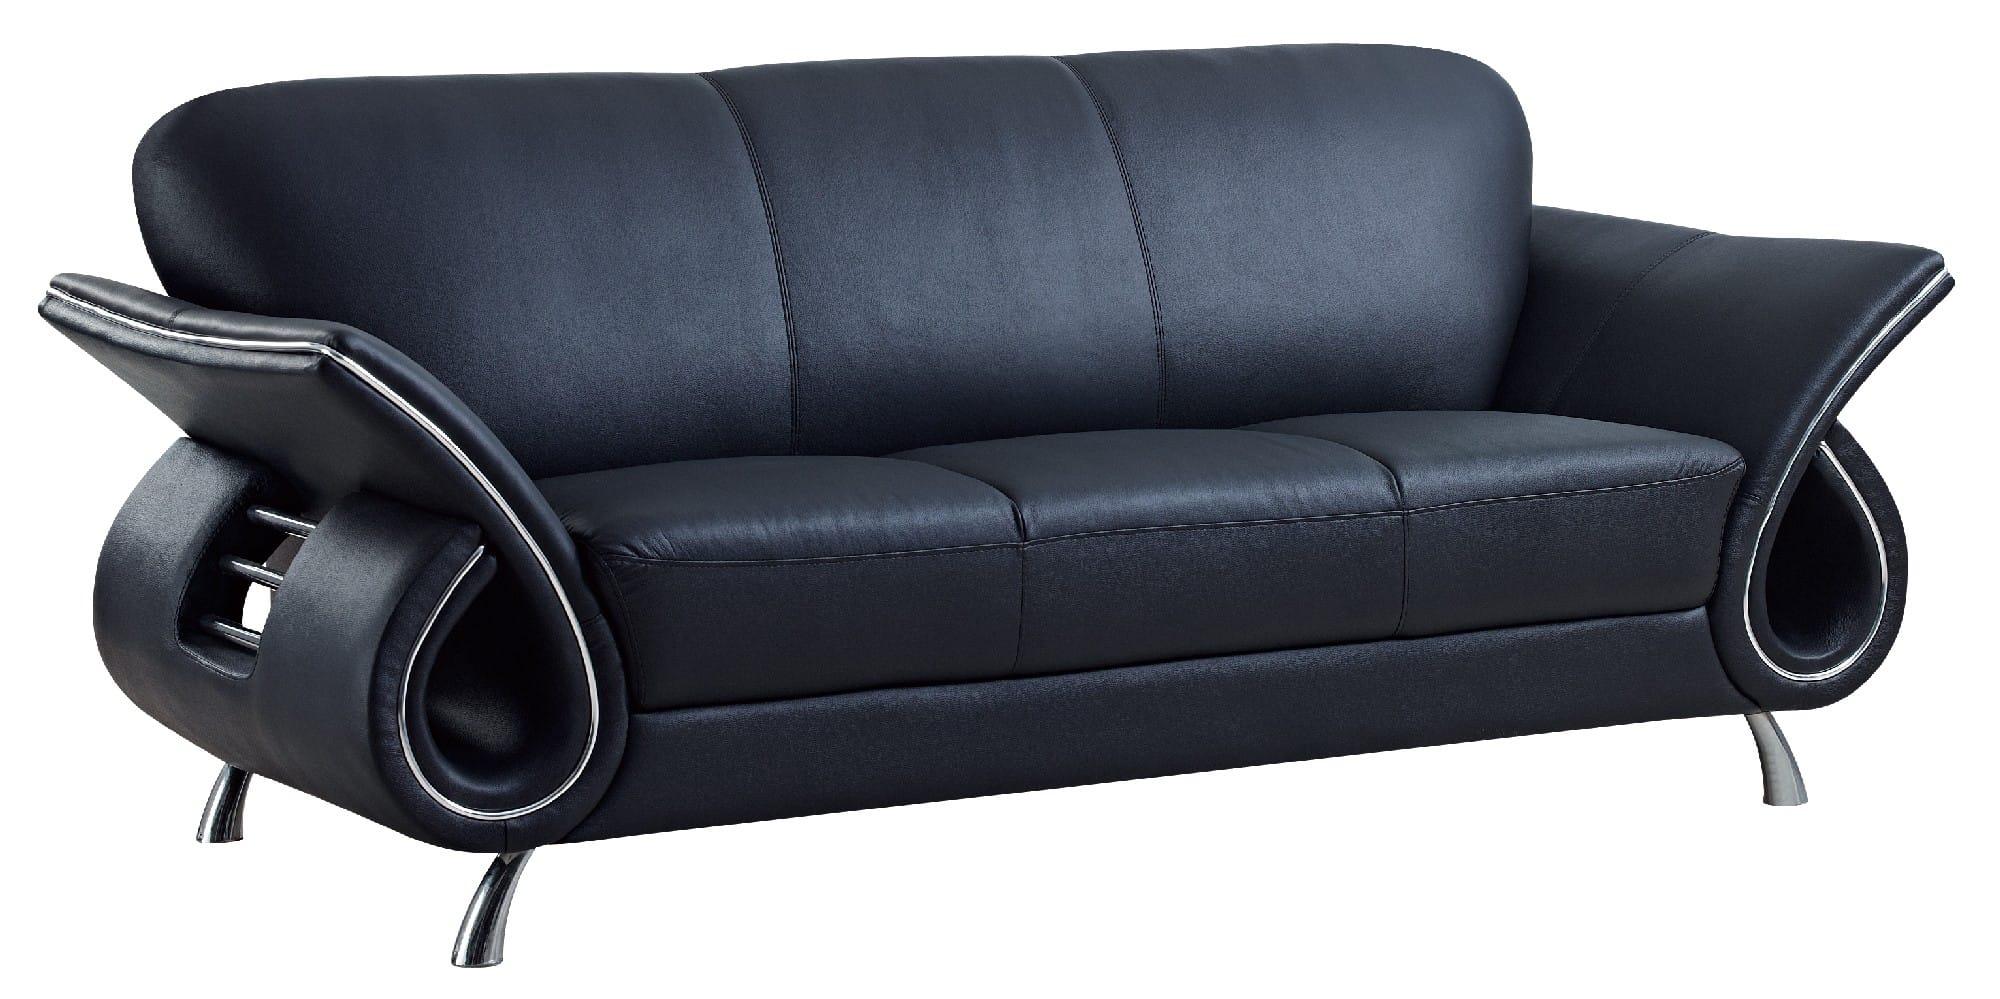 Floor Sample U559 Black Leather Sofa By Global Furniture